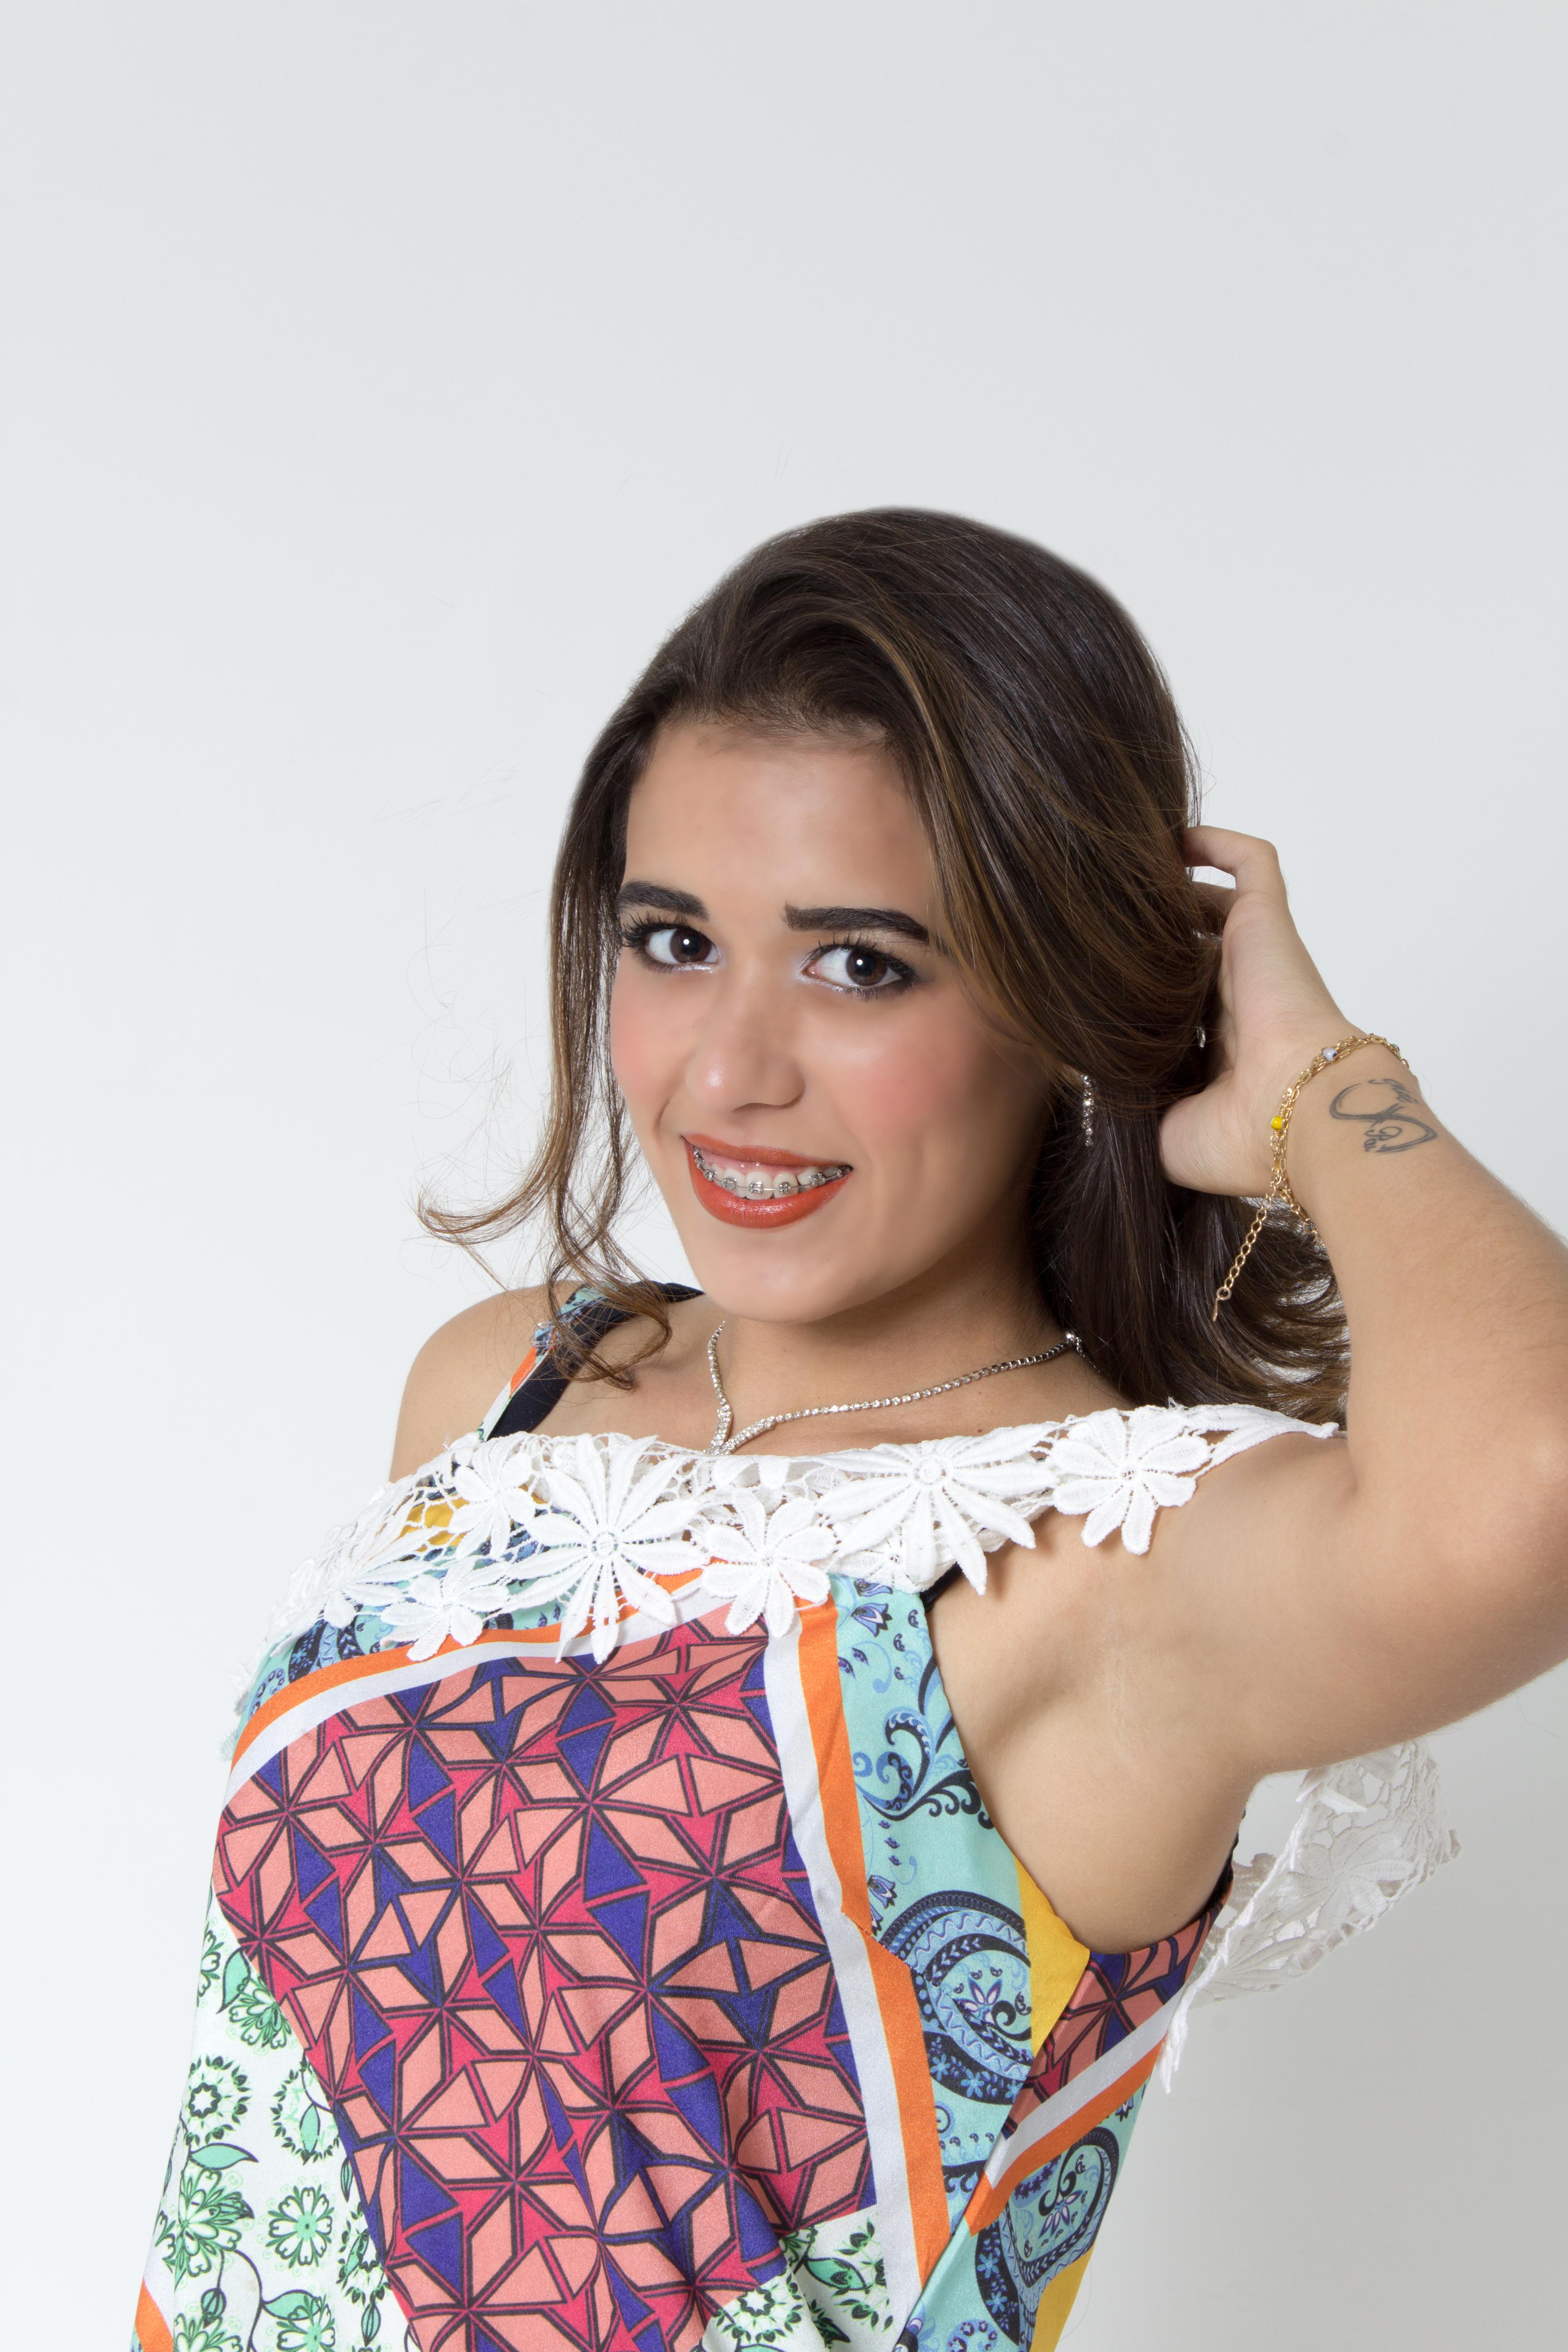 Agatha Christine